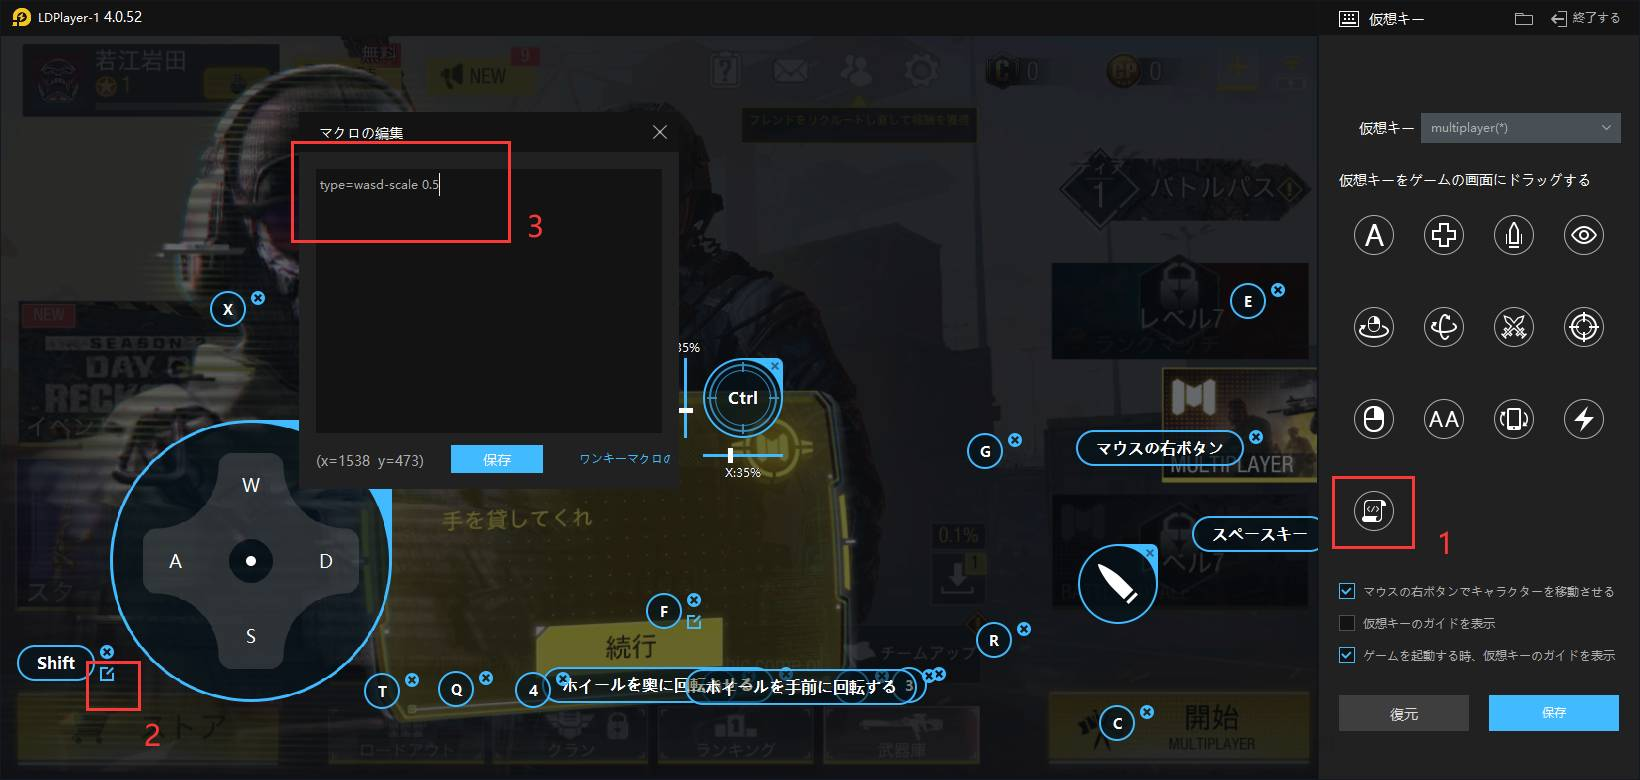 「Standoff 2」「Call of Duty」「PUBG」などのゲームのスローウォーク機能実装